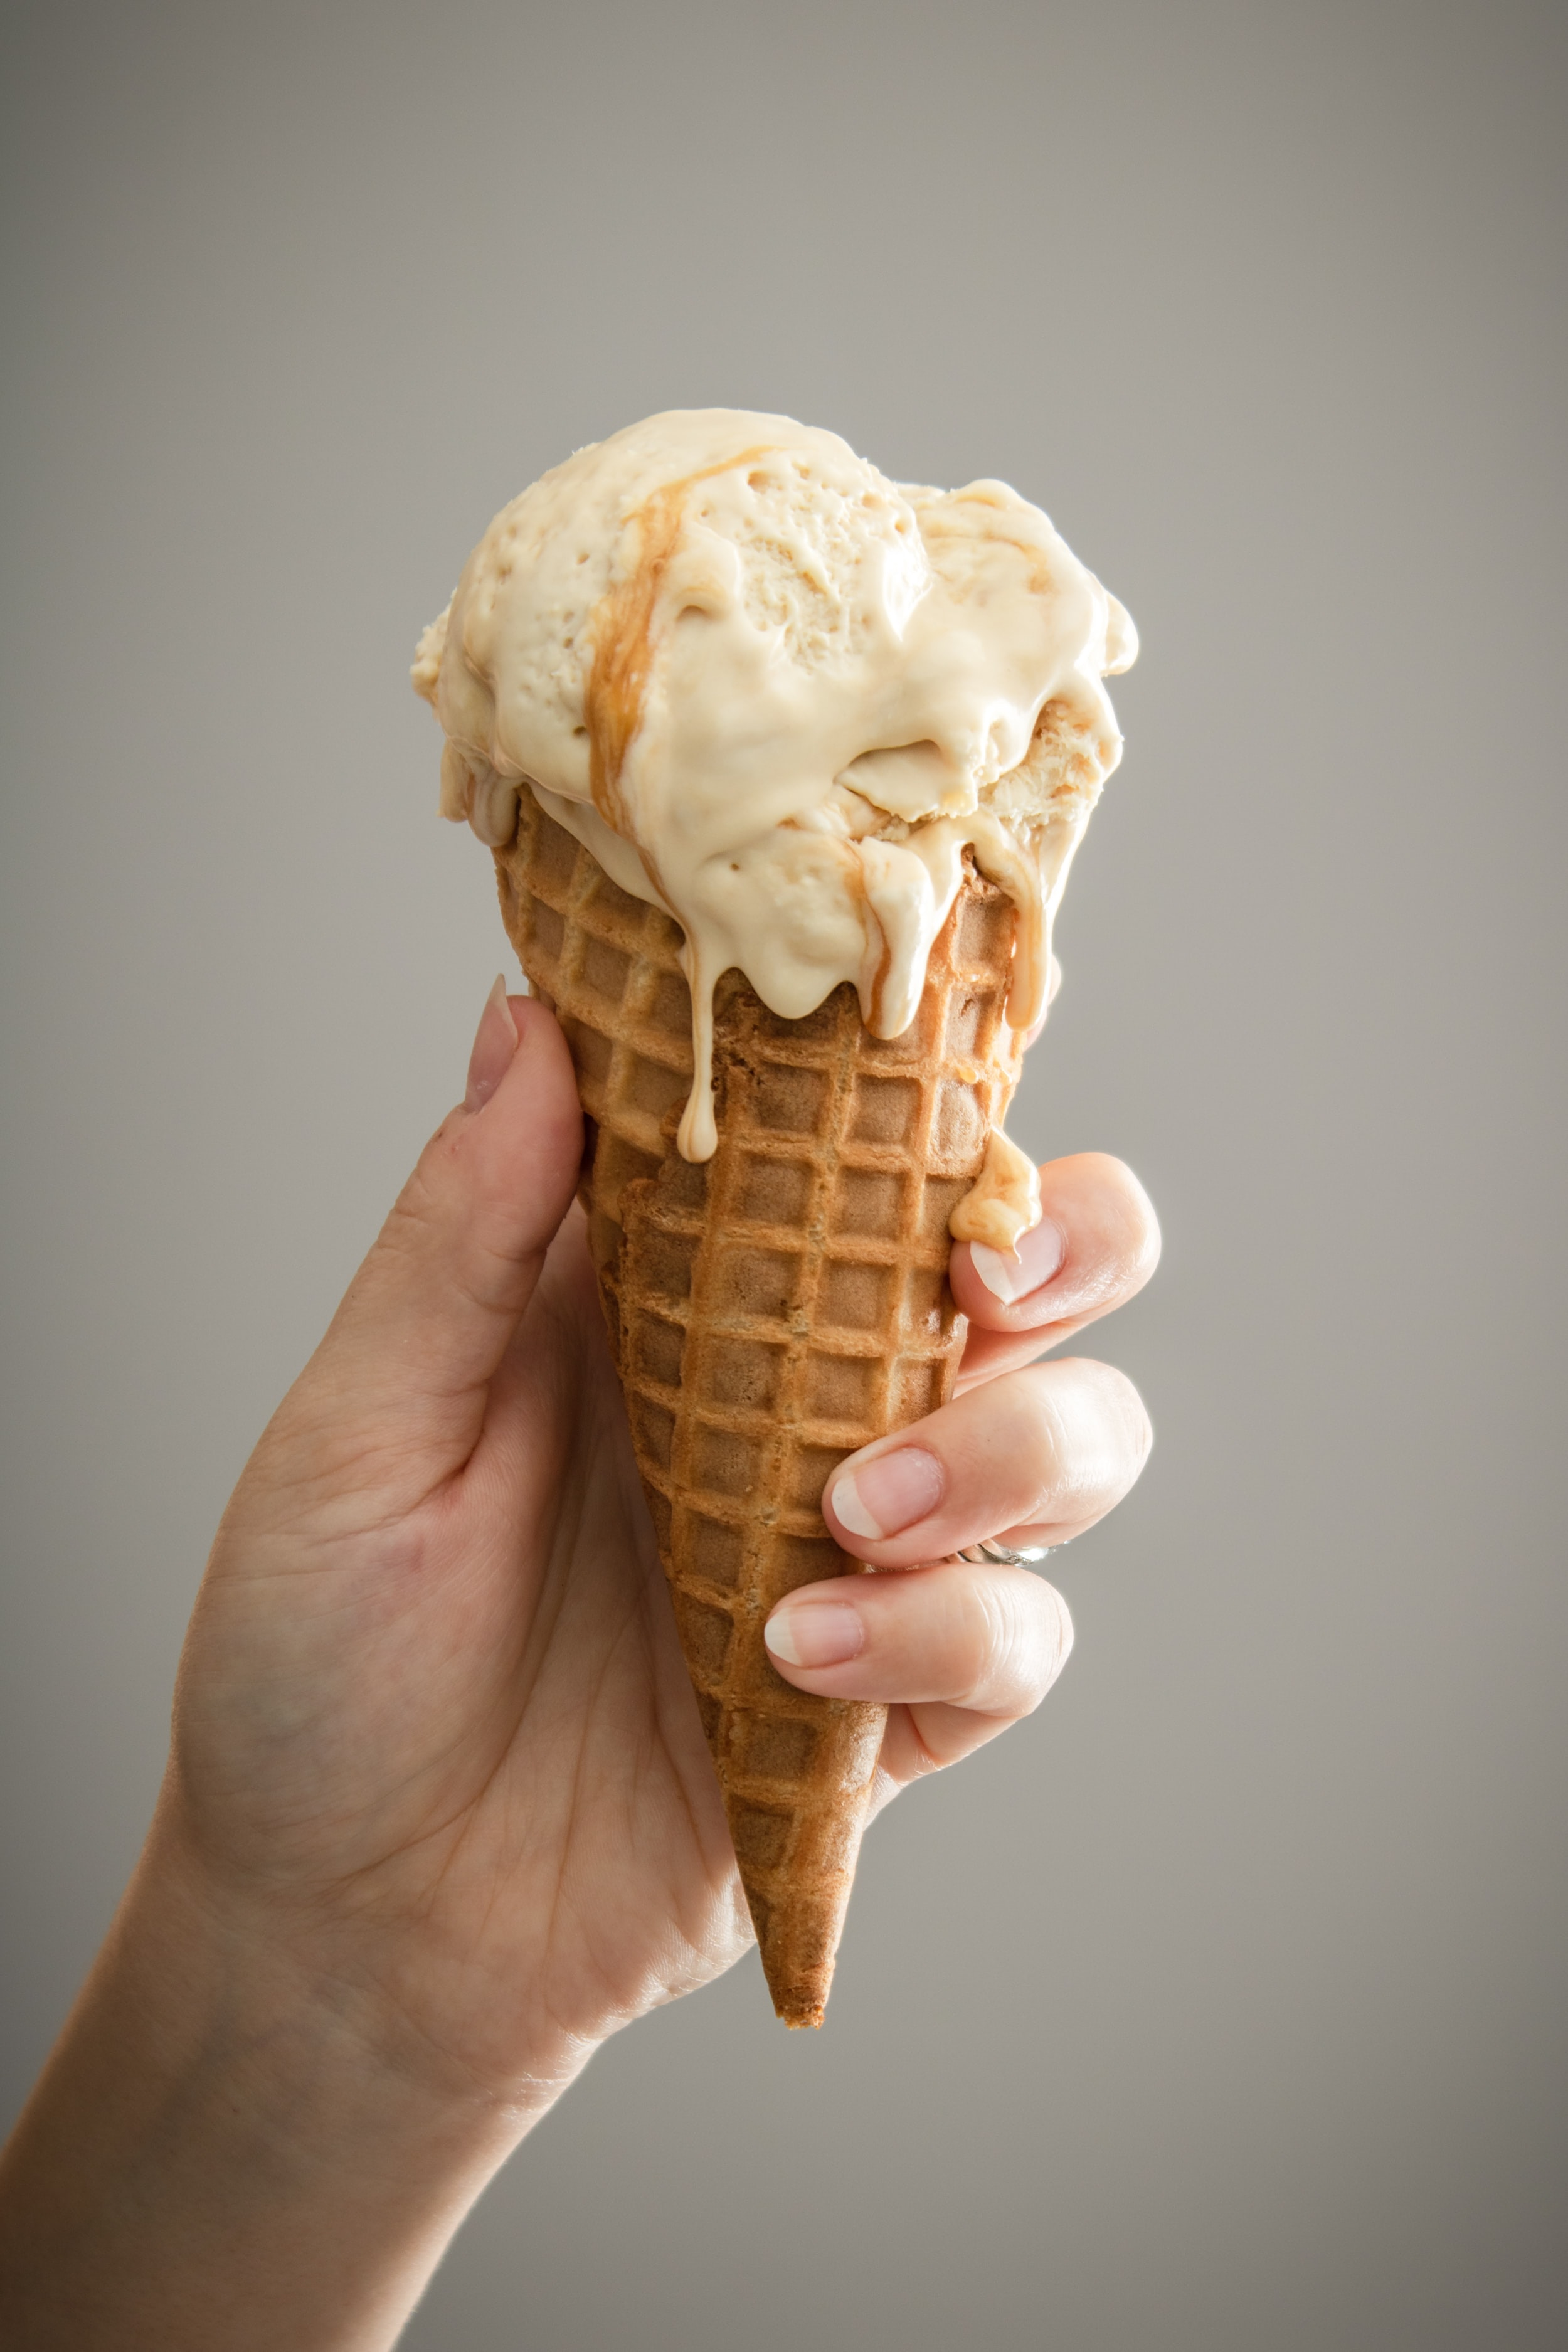 Ice cream melting in hand. Photo courtesy of Dana DeVolk on Unsplash.